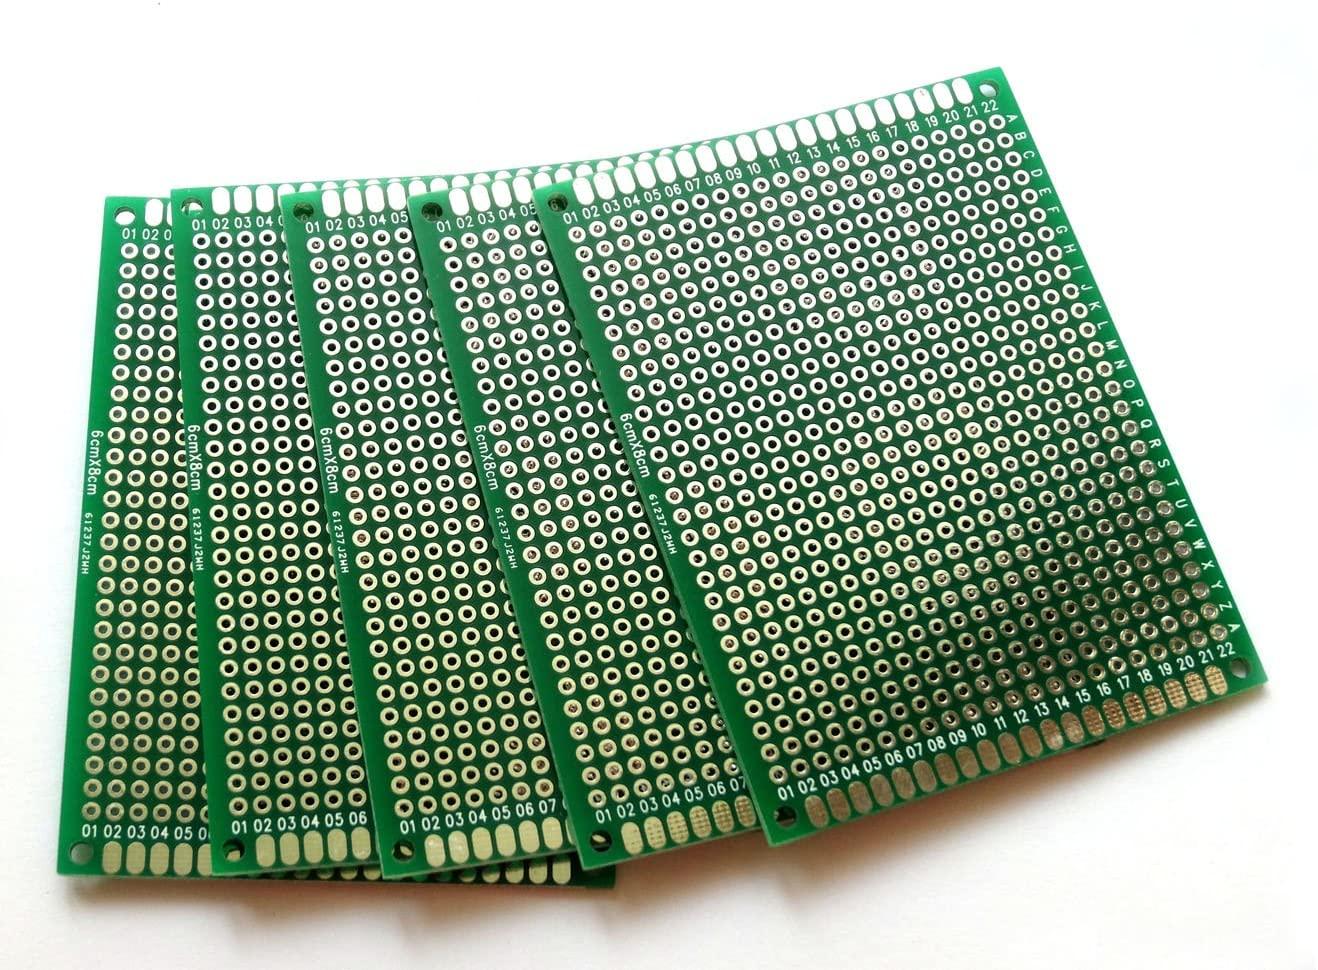 Penta Angel 10pcs Double-Side Prototype PCB Universal Printed Circuit Board Universal PCB Circuit Board (6x8cm)